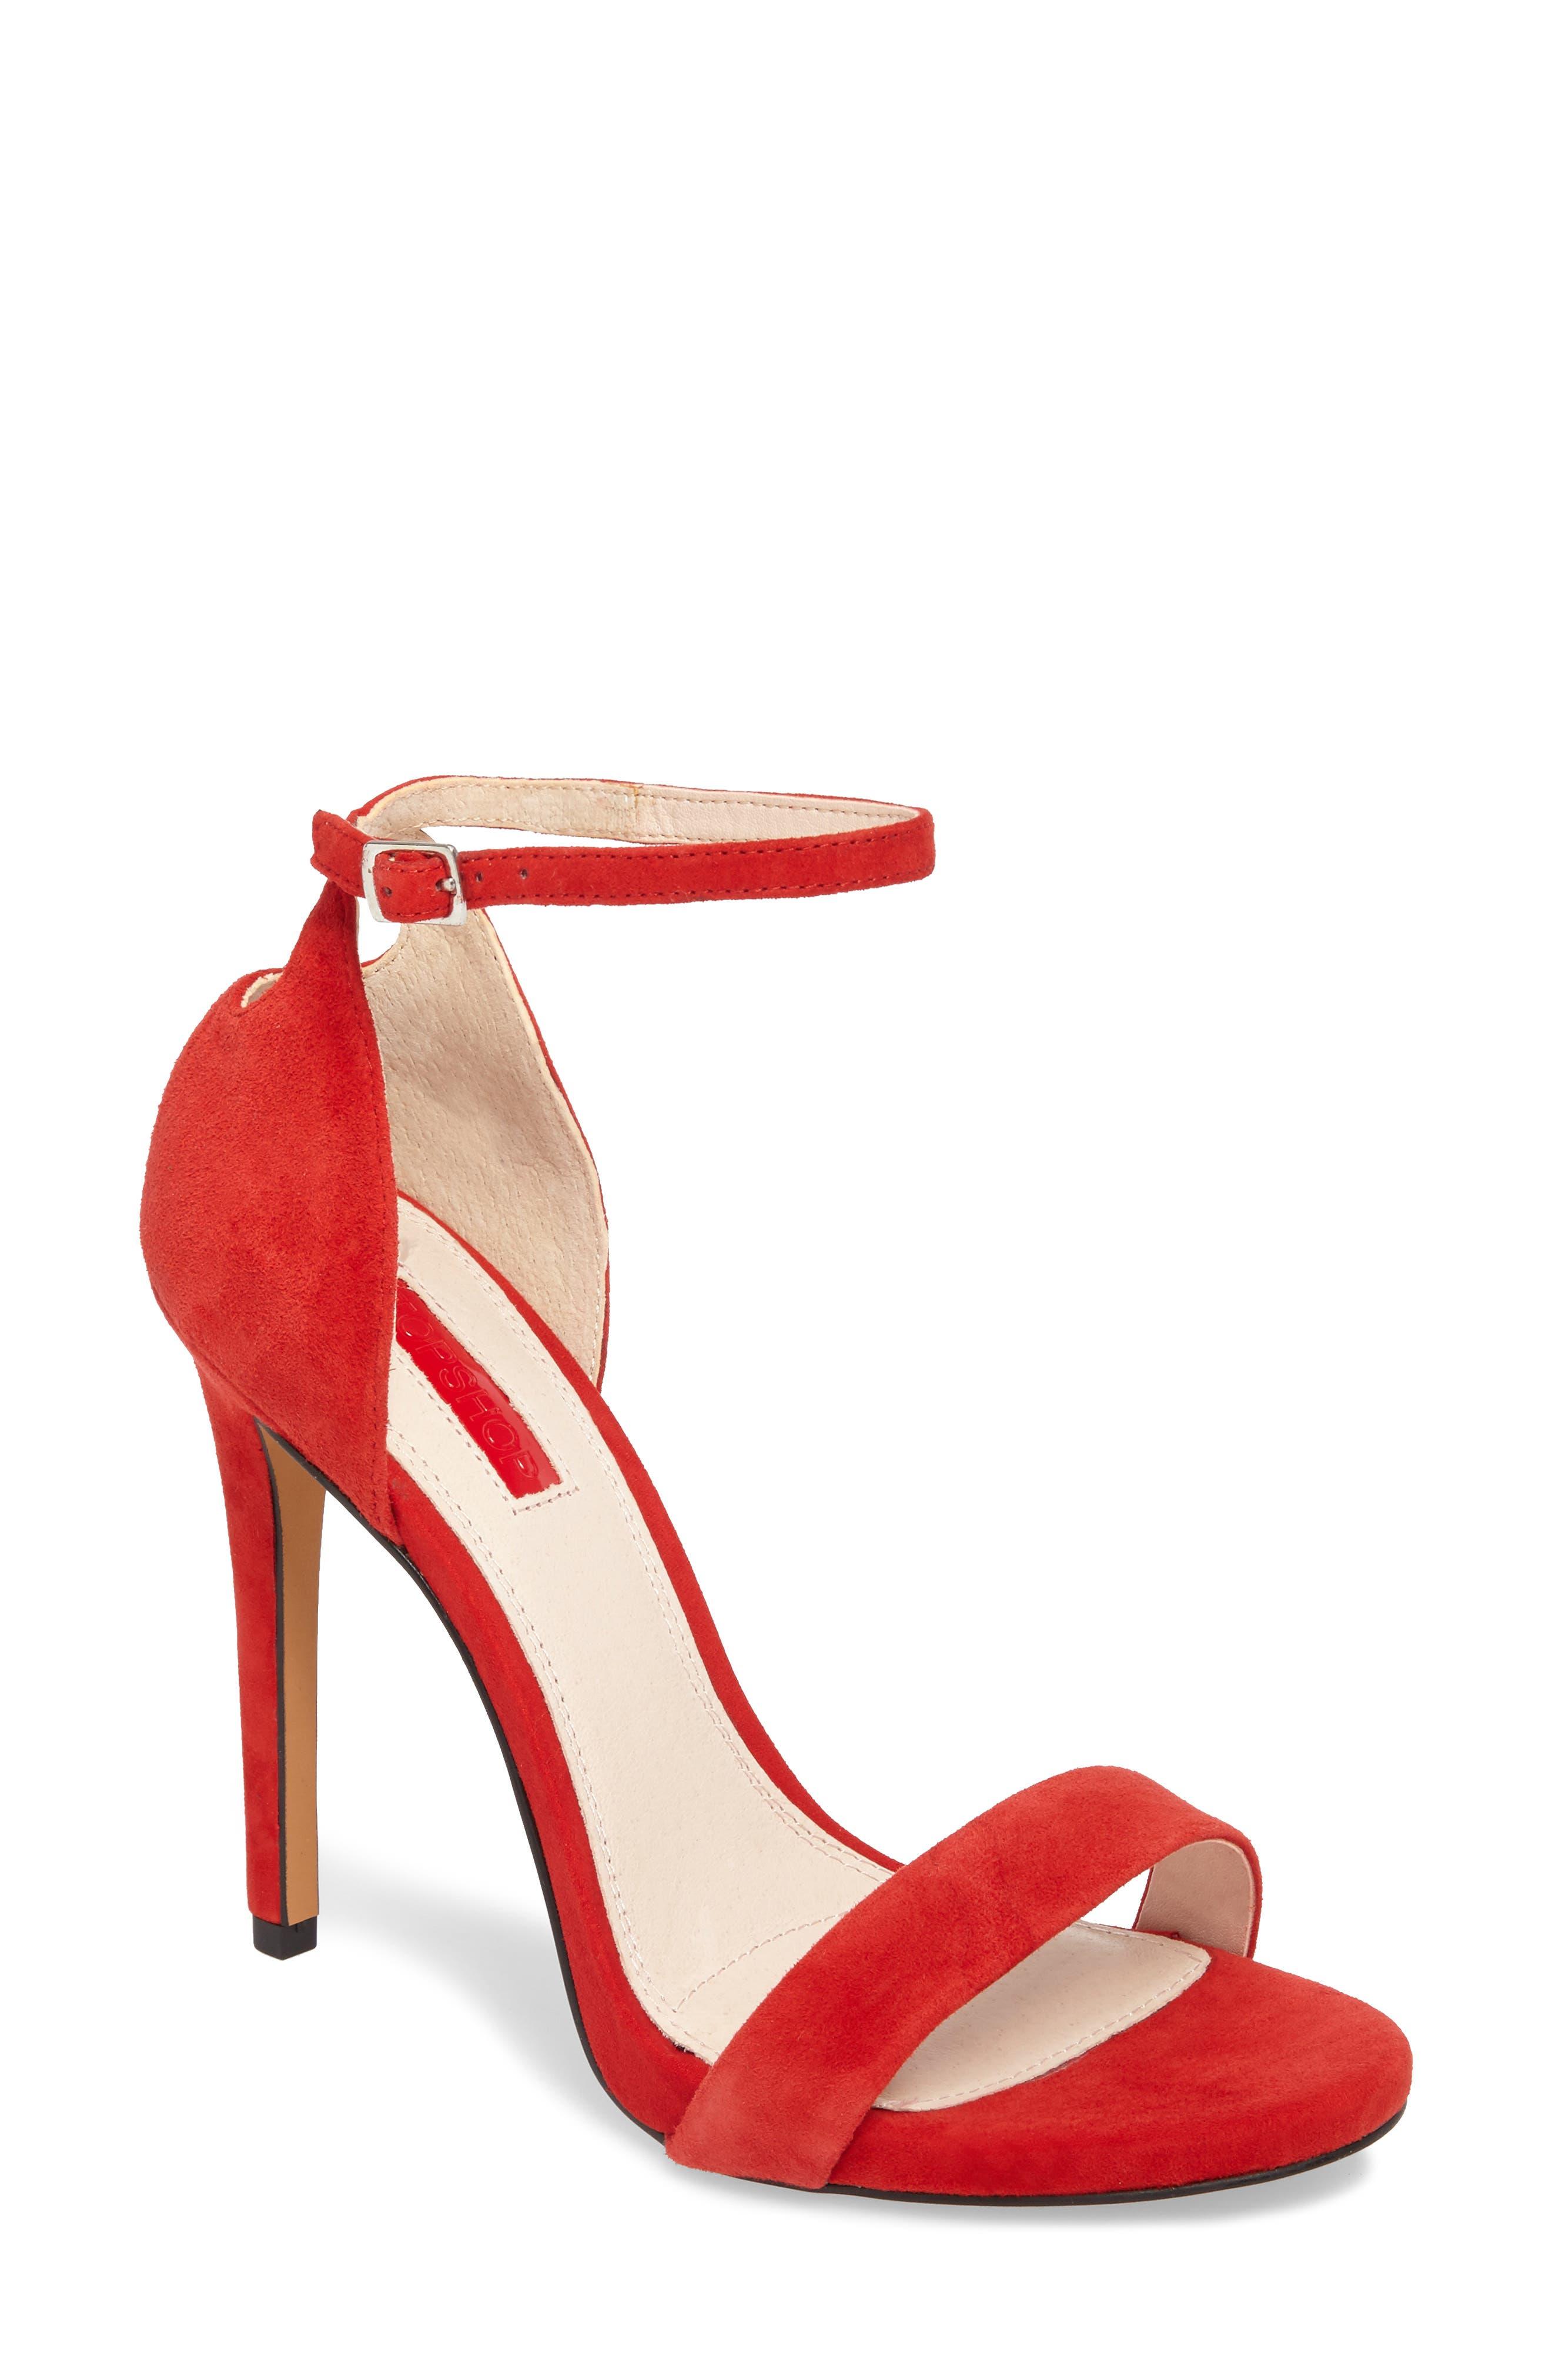 Alternate Image 1 Selected - Topshop Raphie Ankle Strap Sandal (Women)